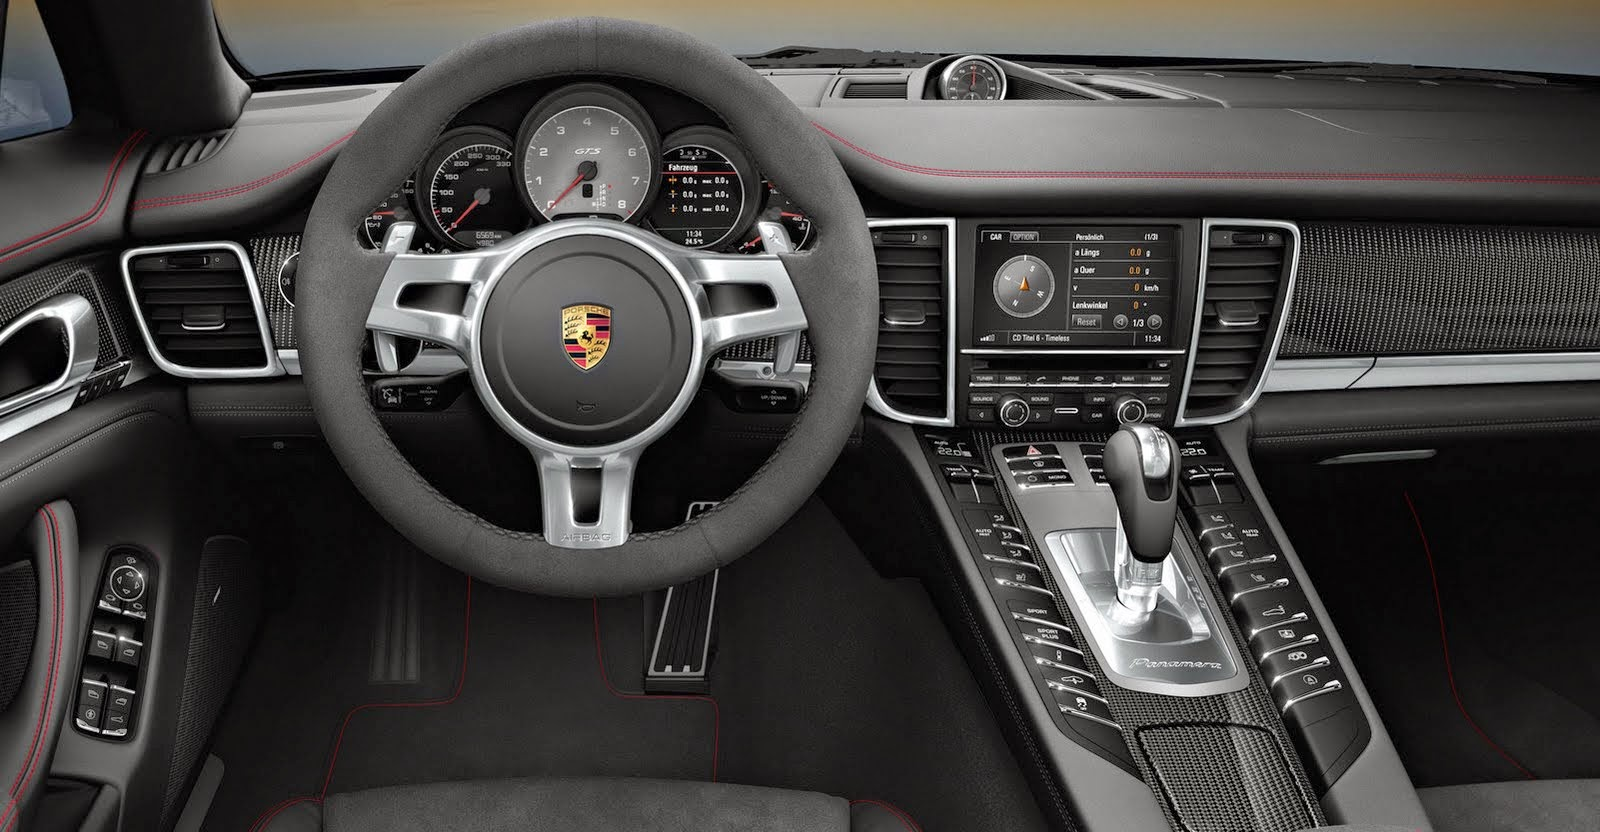 Porsche Panamera inside